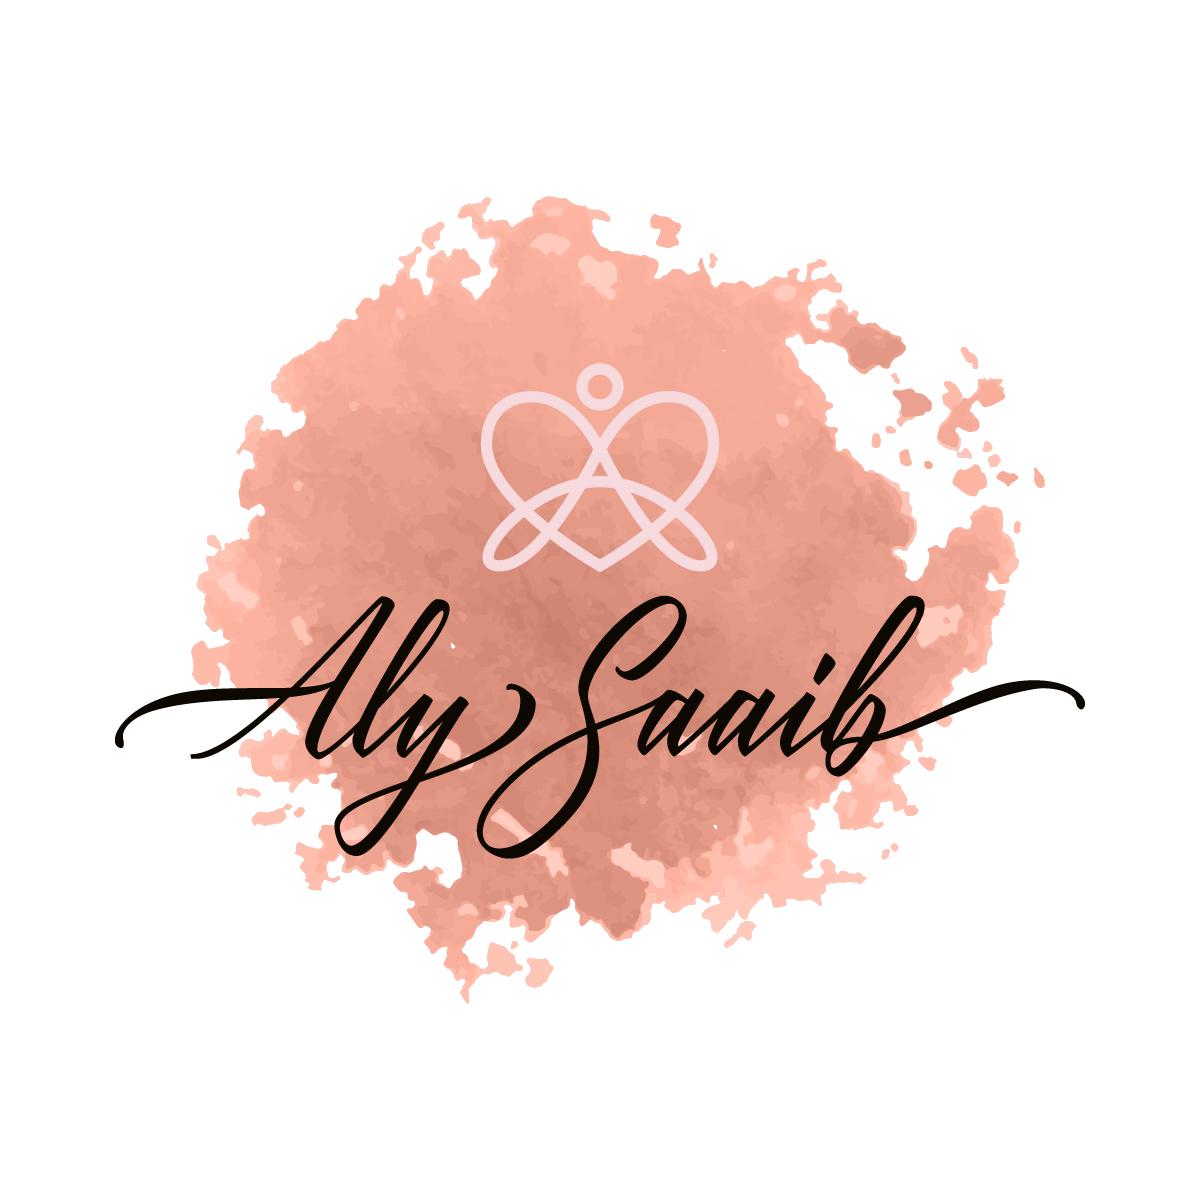 alysaaib-logo-lettering.jpg